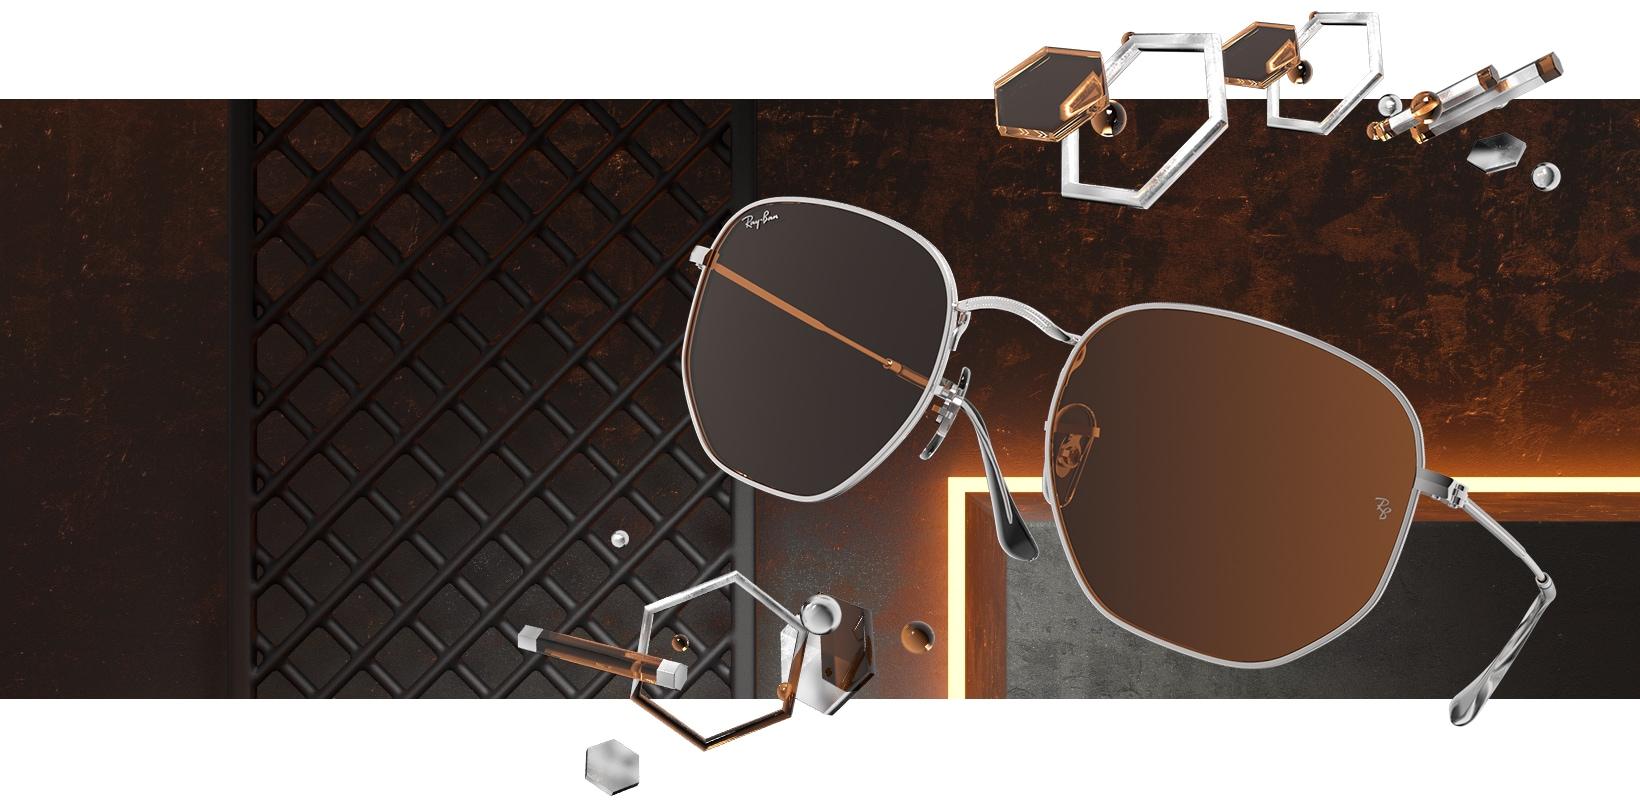 d382d76f7a Custom and Personalized Sunglasses   Eyeglasses